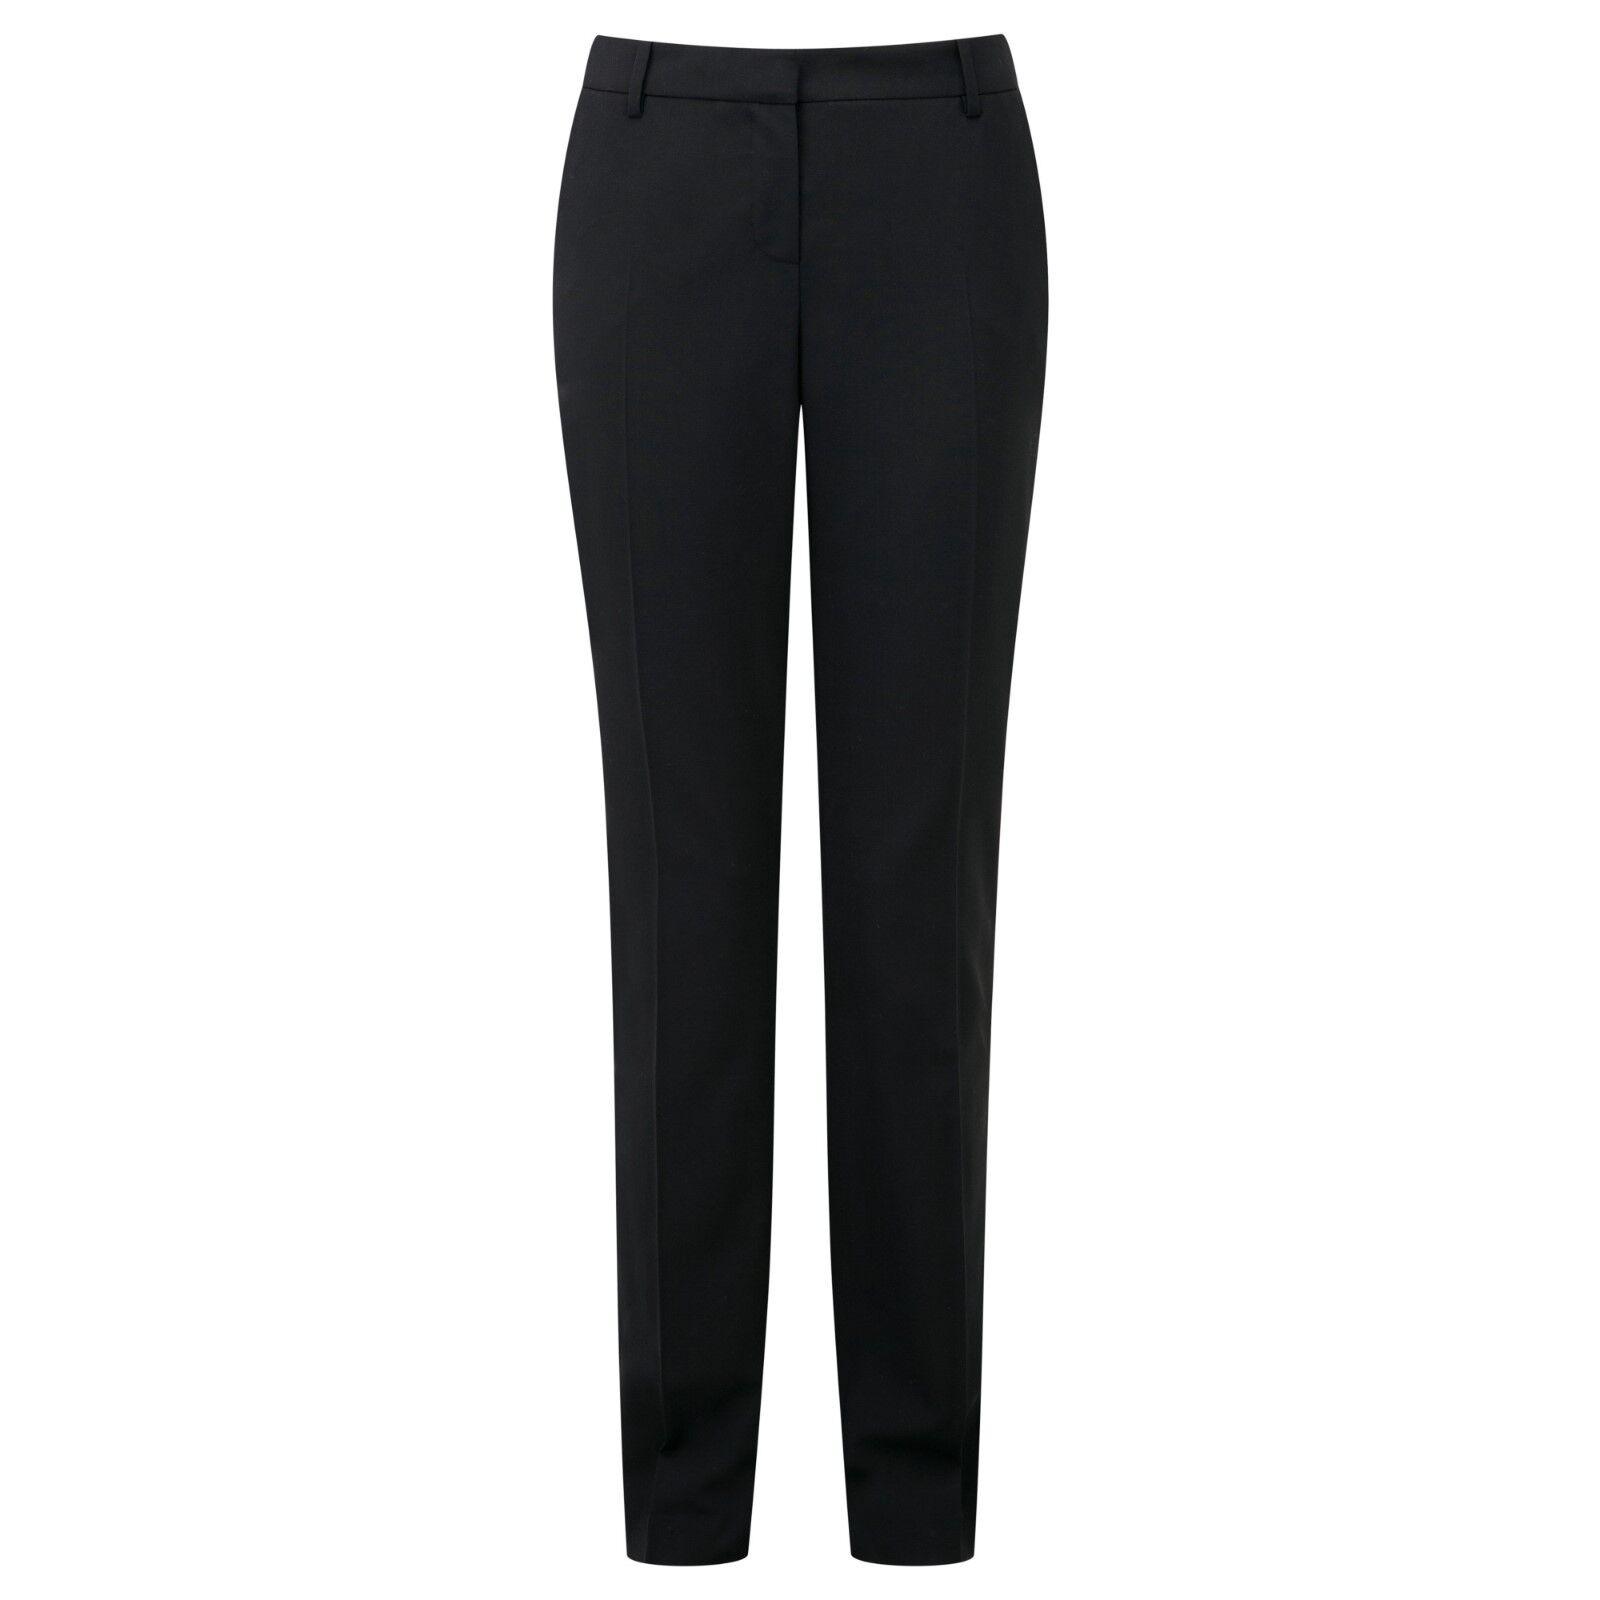 BNWT Pure Collection Slim Leg Leg Leg Pantaloni Misto Lana-Nero-Taglia 10 S Rrp 135e30